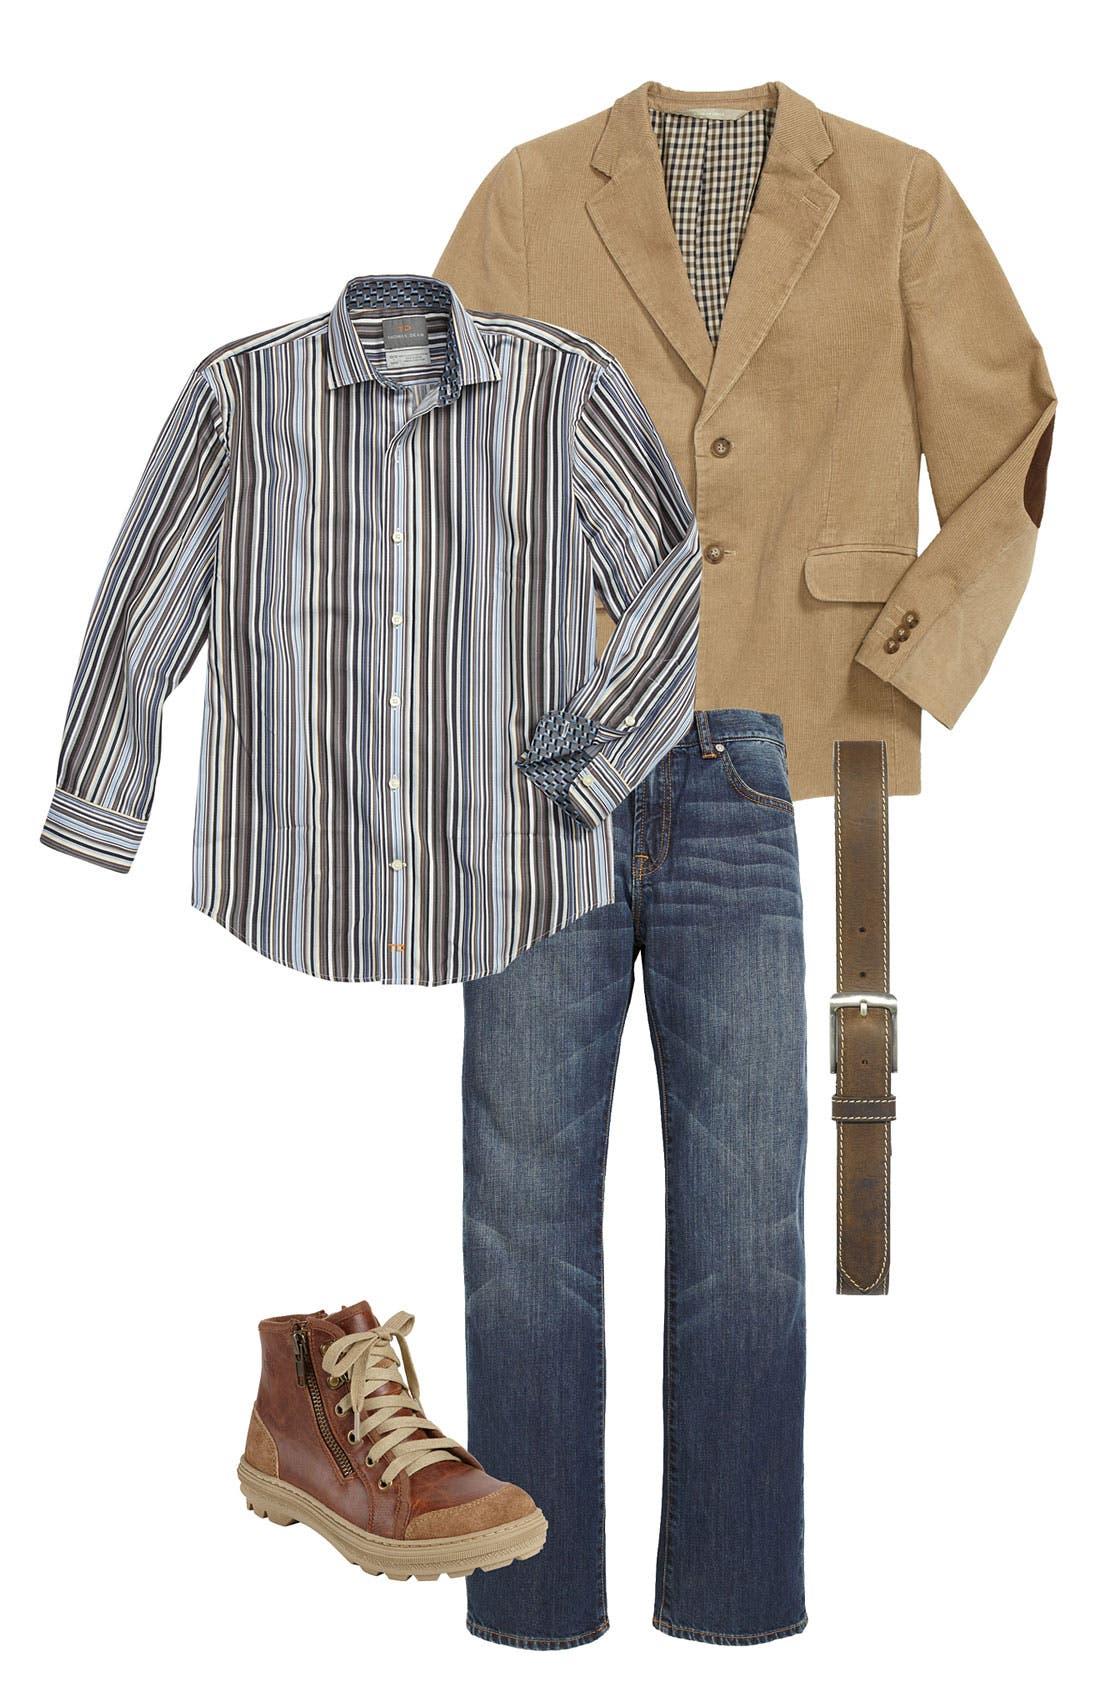 Main Image - Nordstrom Blazer, Thomas Dean Dress Shirt & Cole Haan Boot (Big Boys)